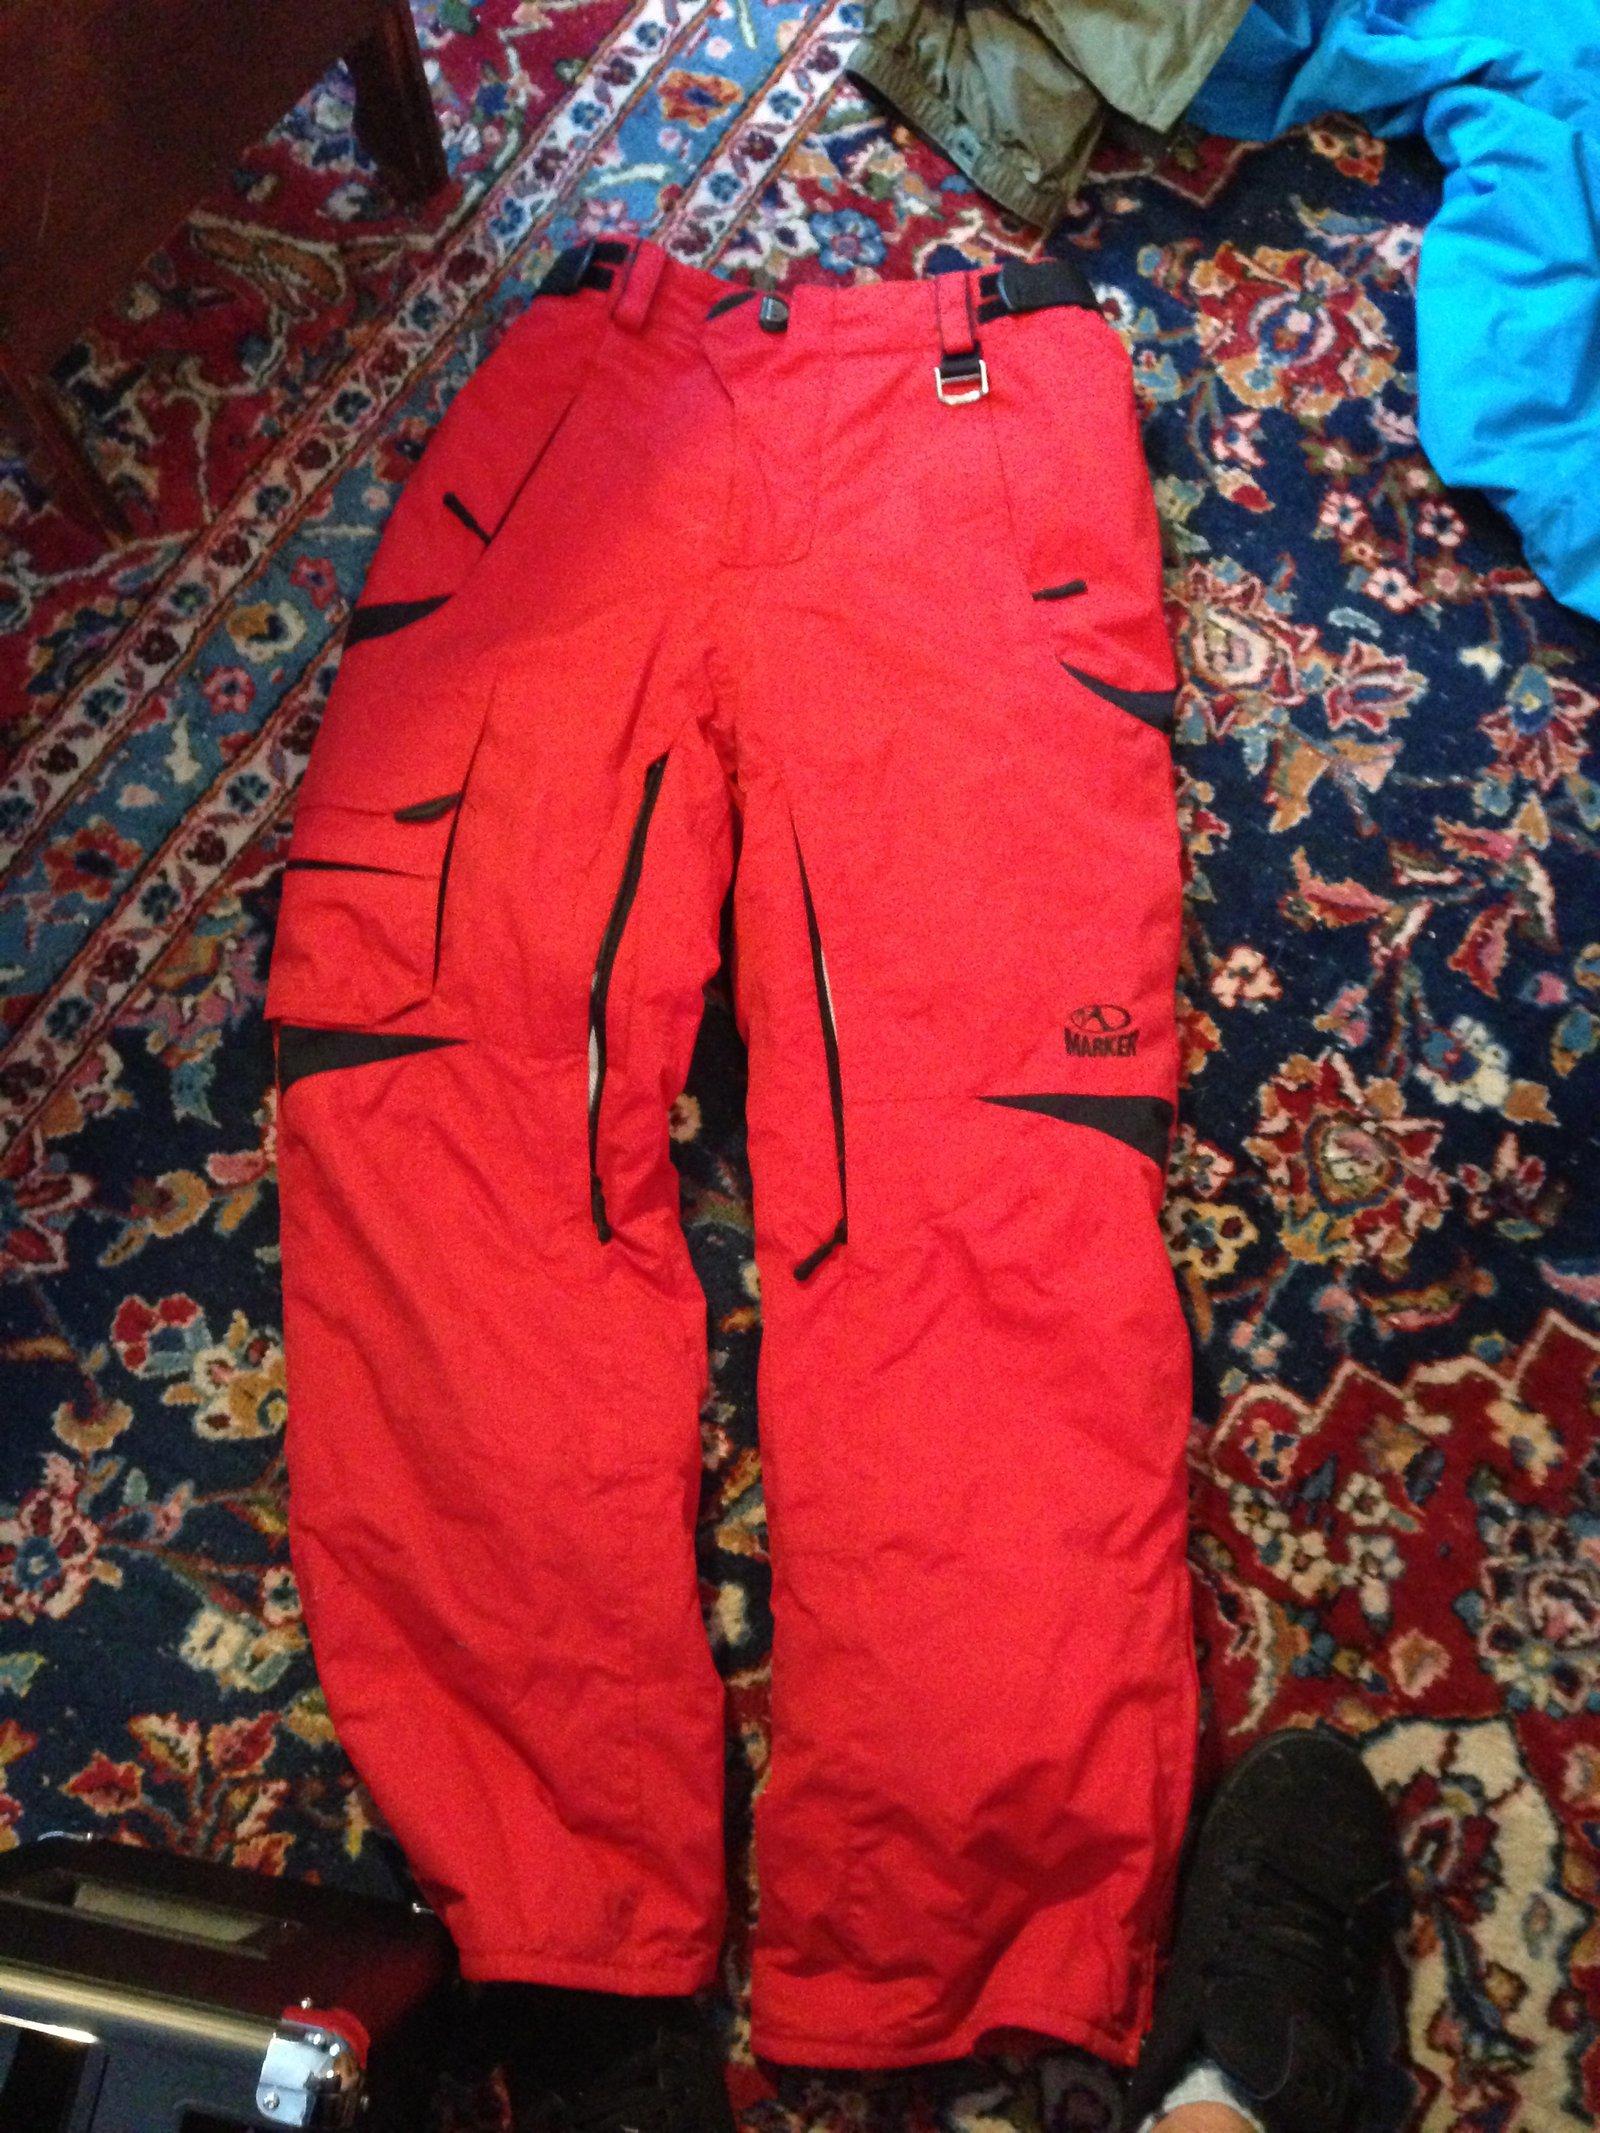 Marker pants for sale